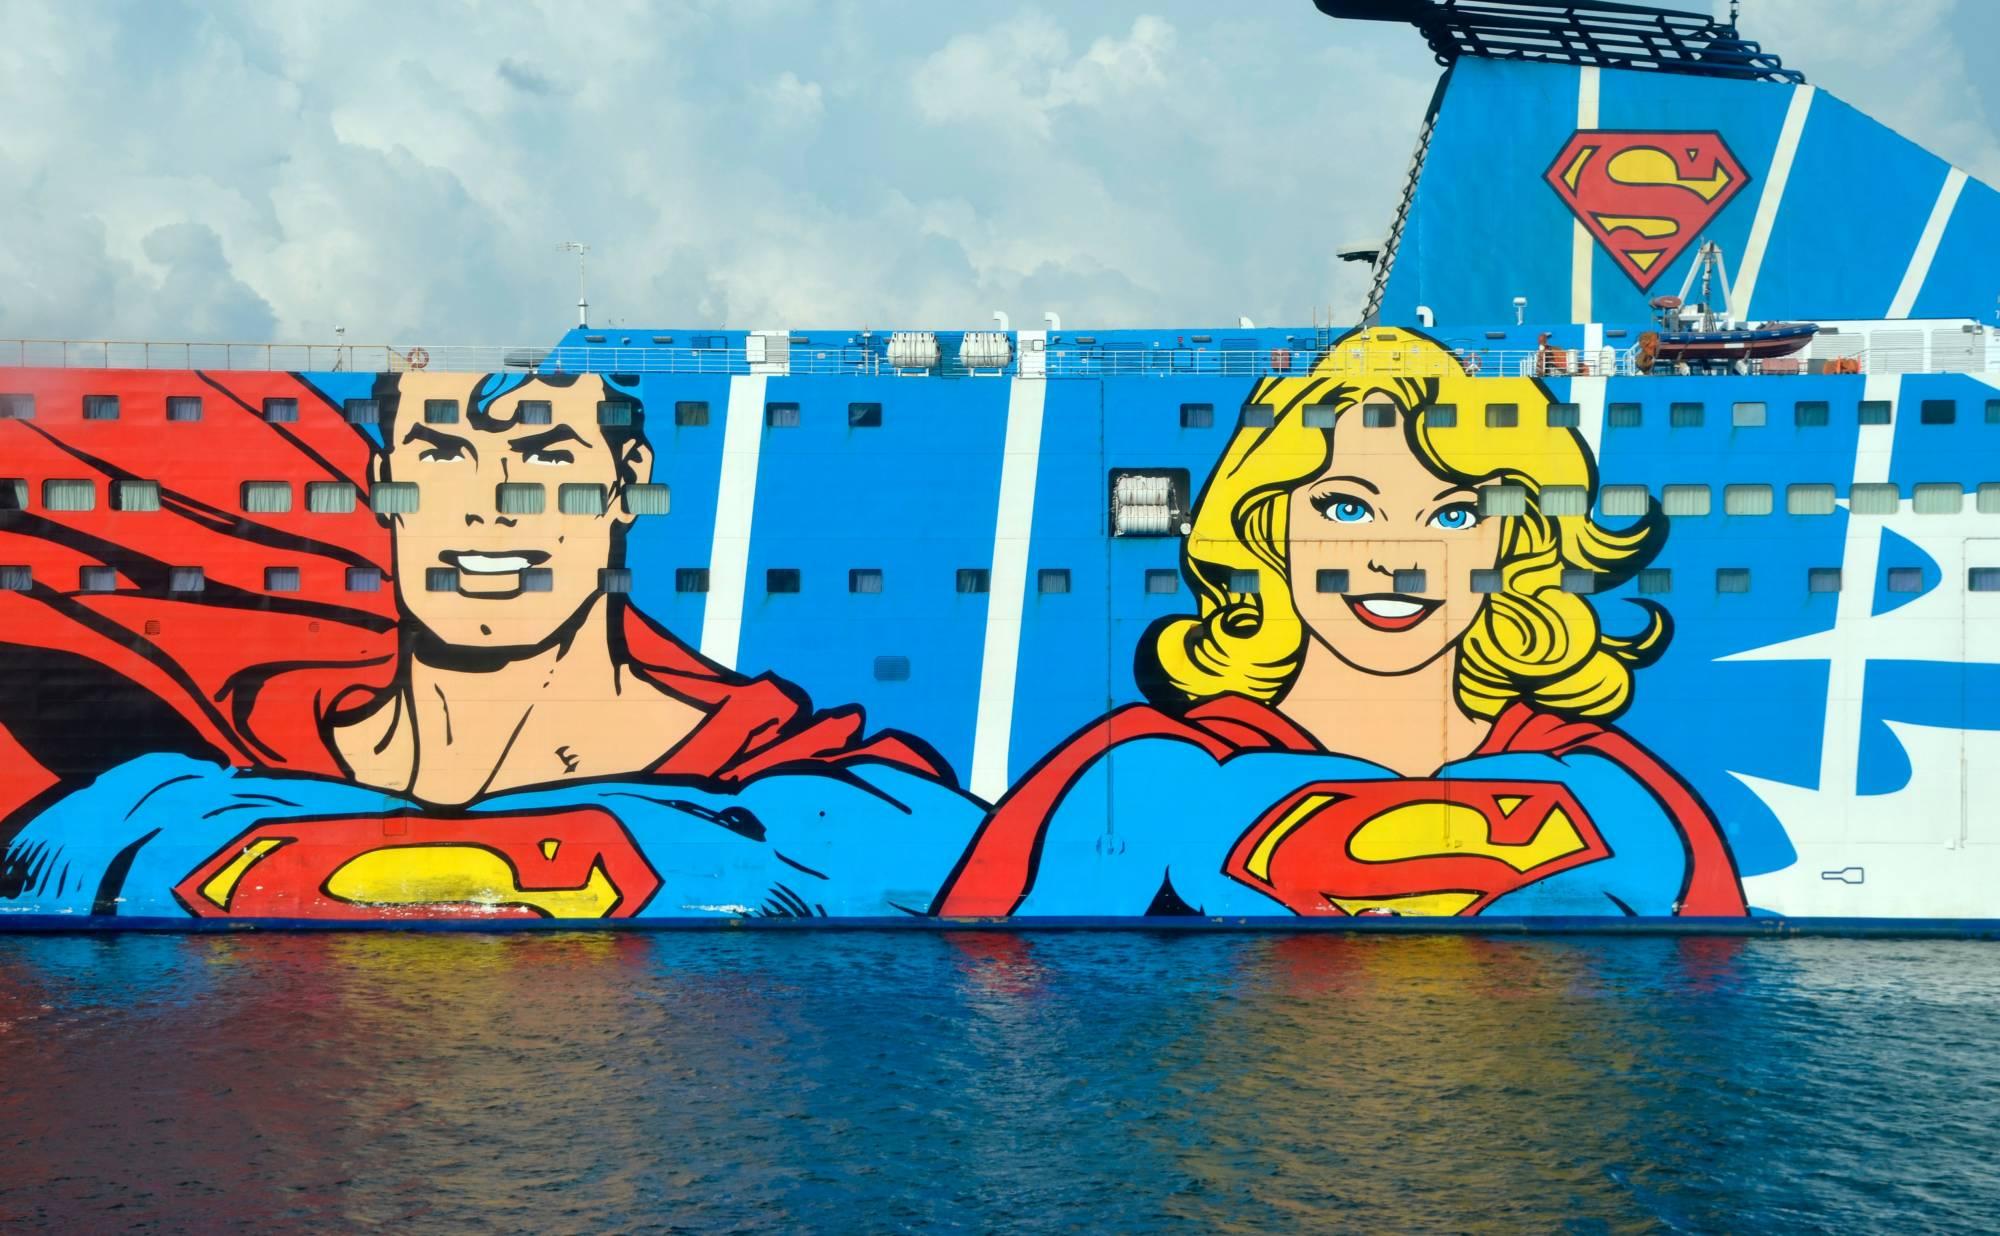 Ship with superhero